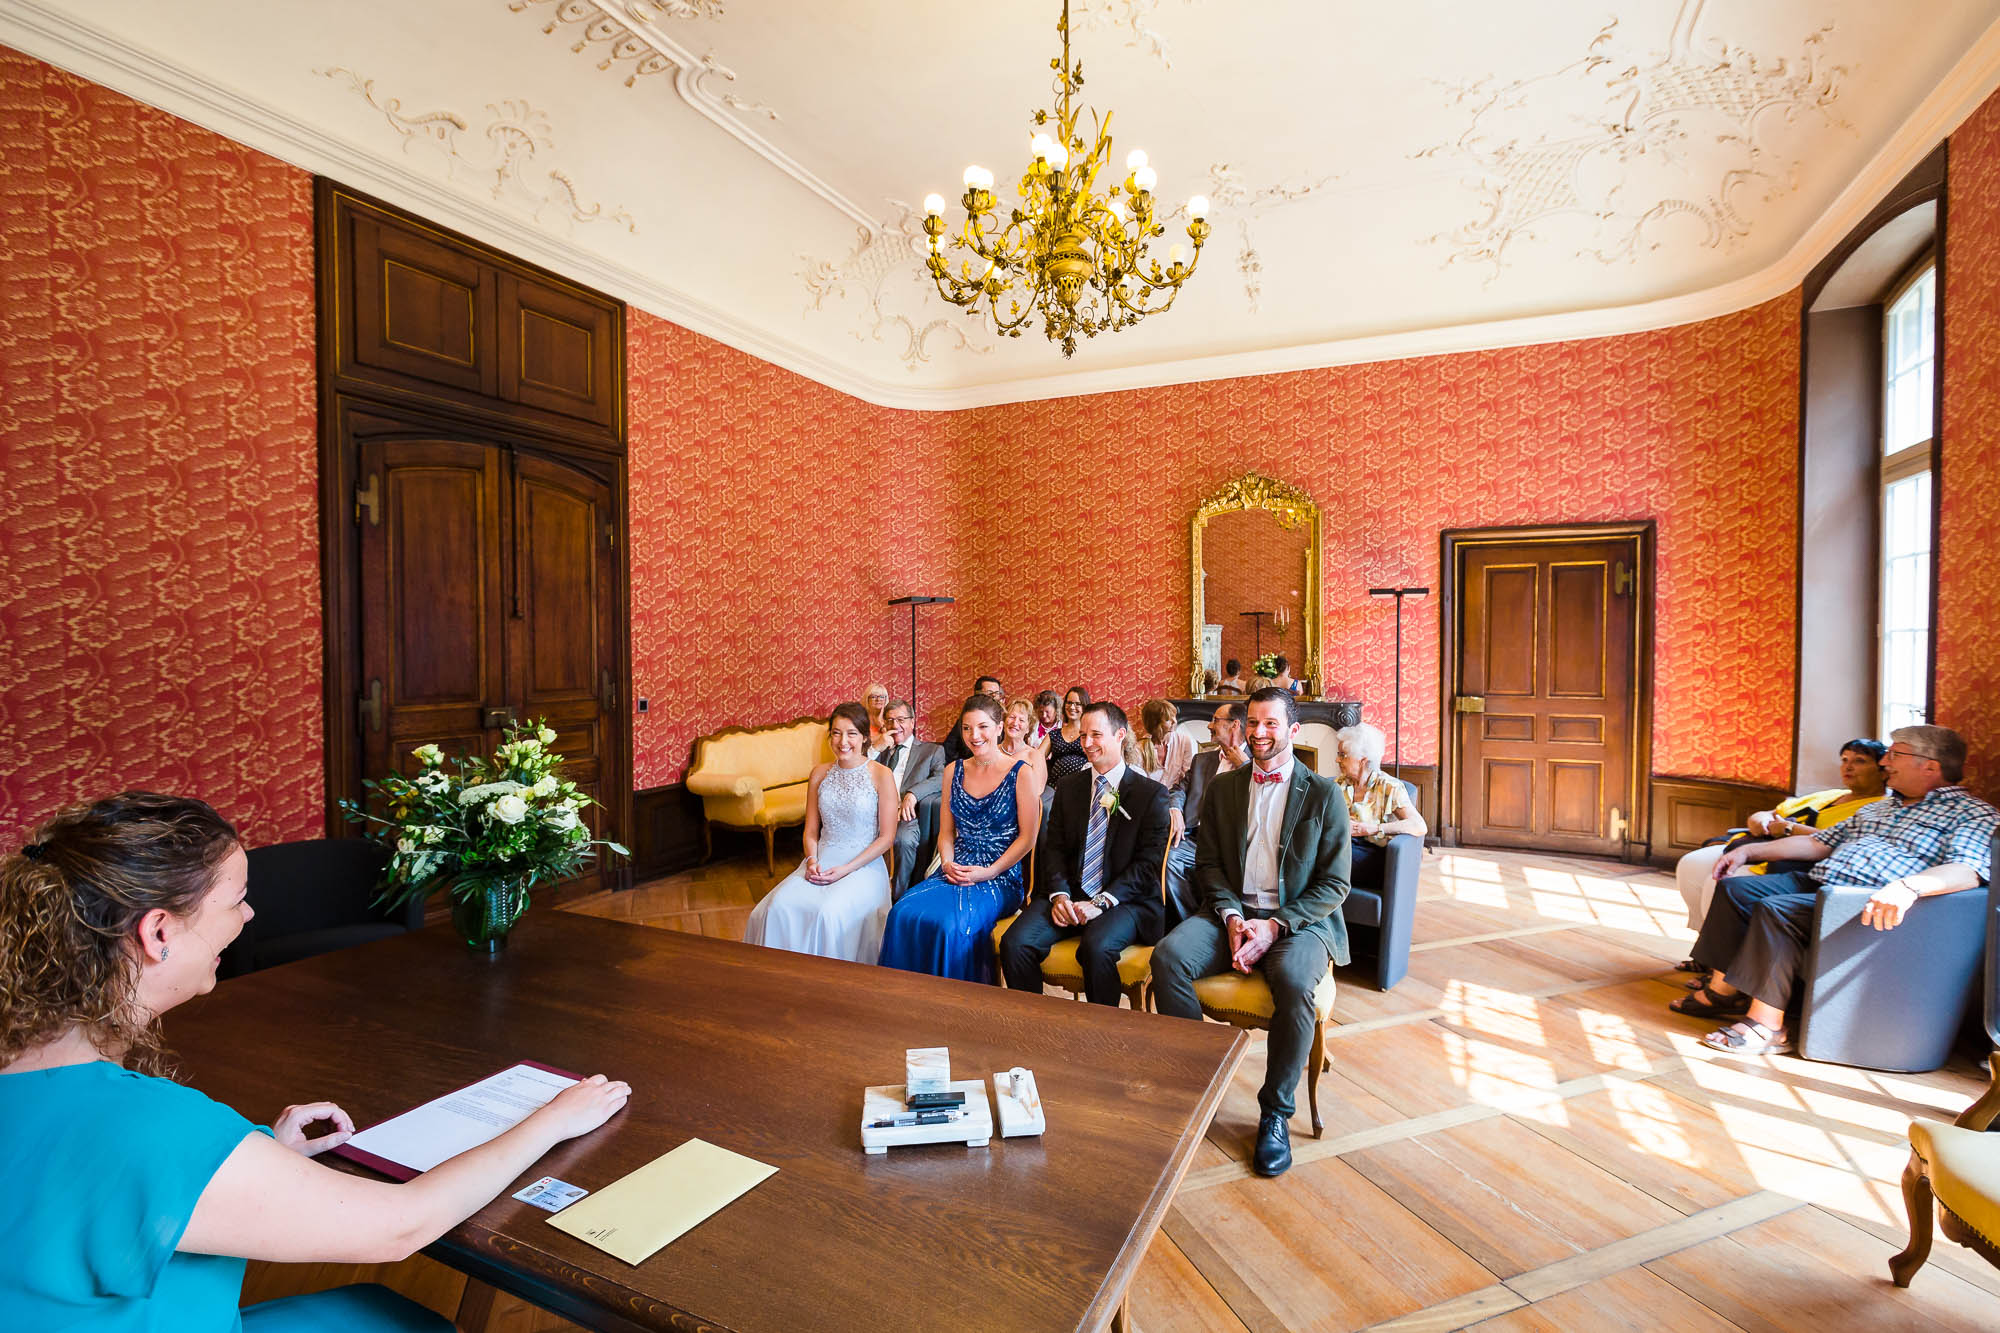 Hochzeitsfotos Bern Bümpliz